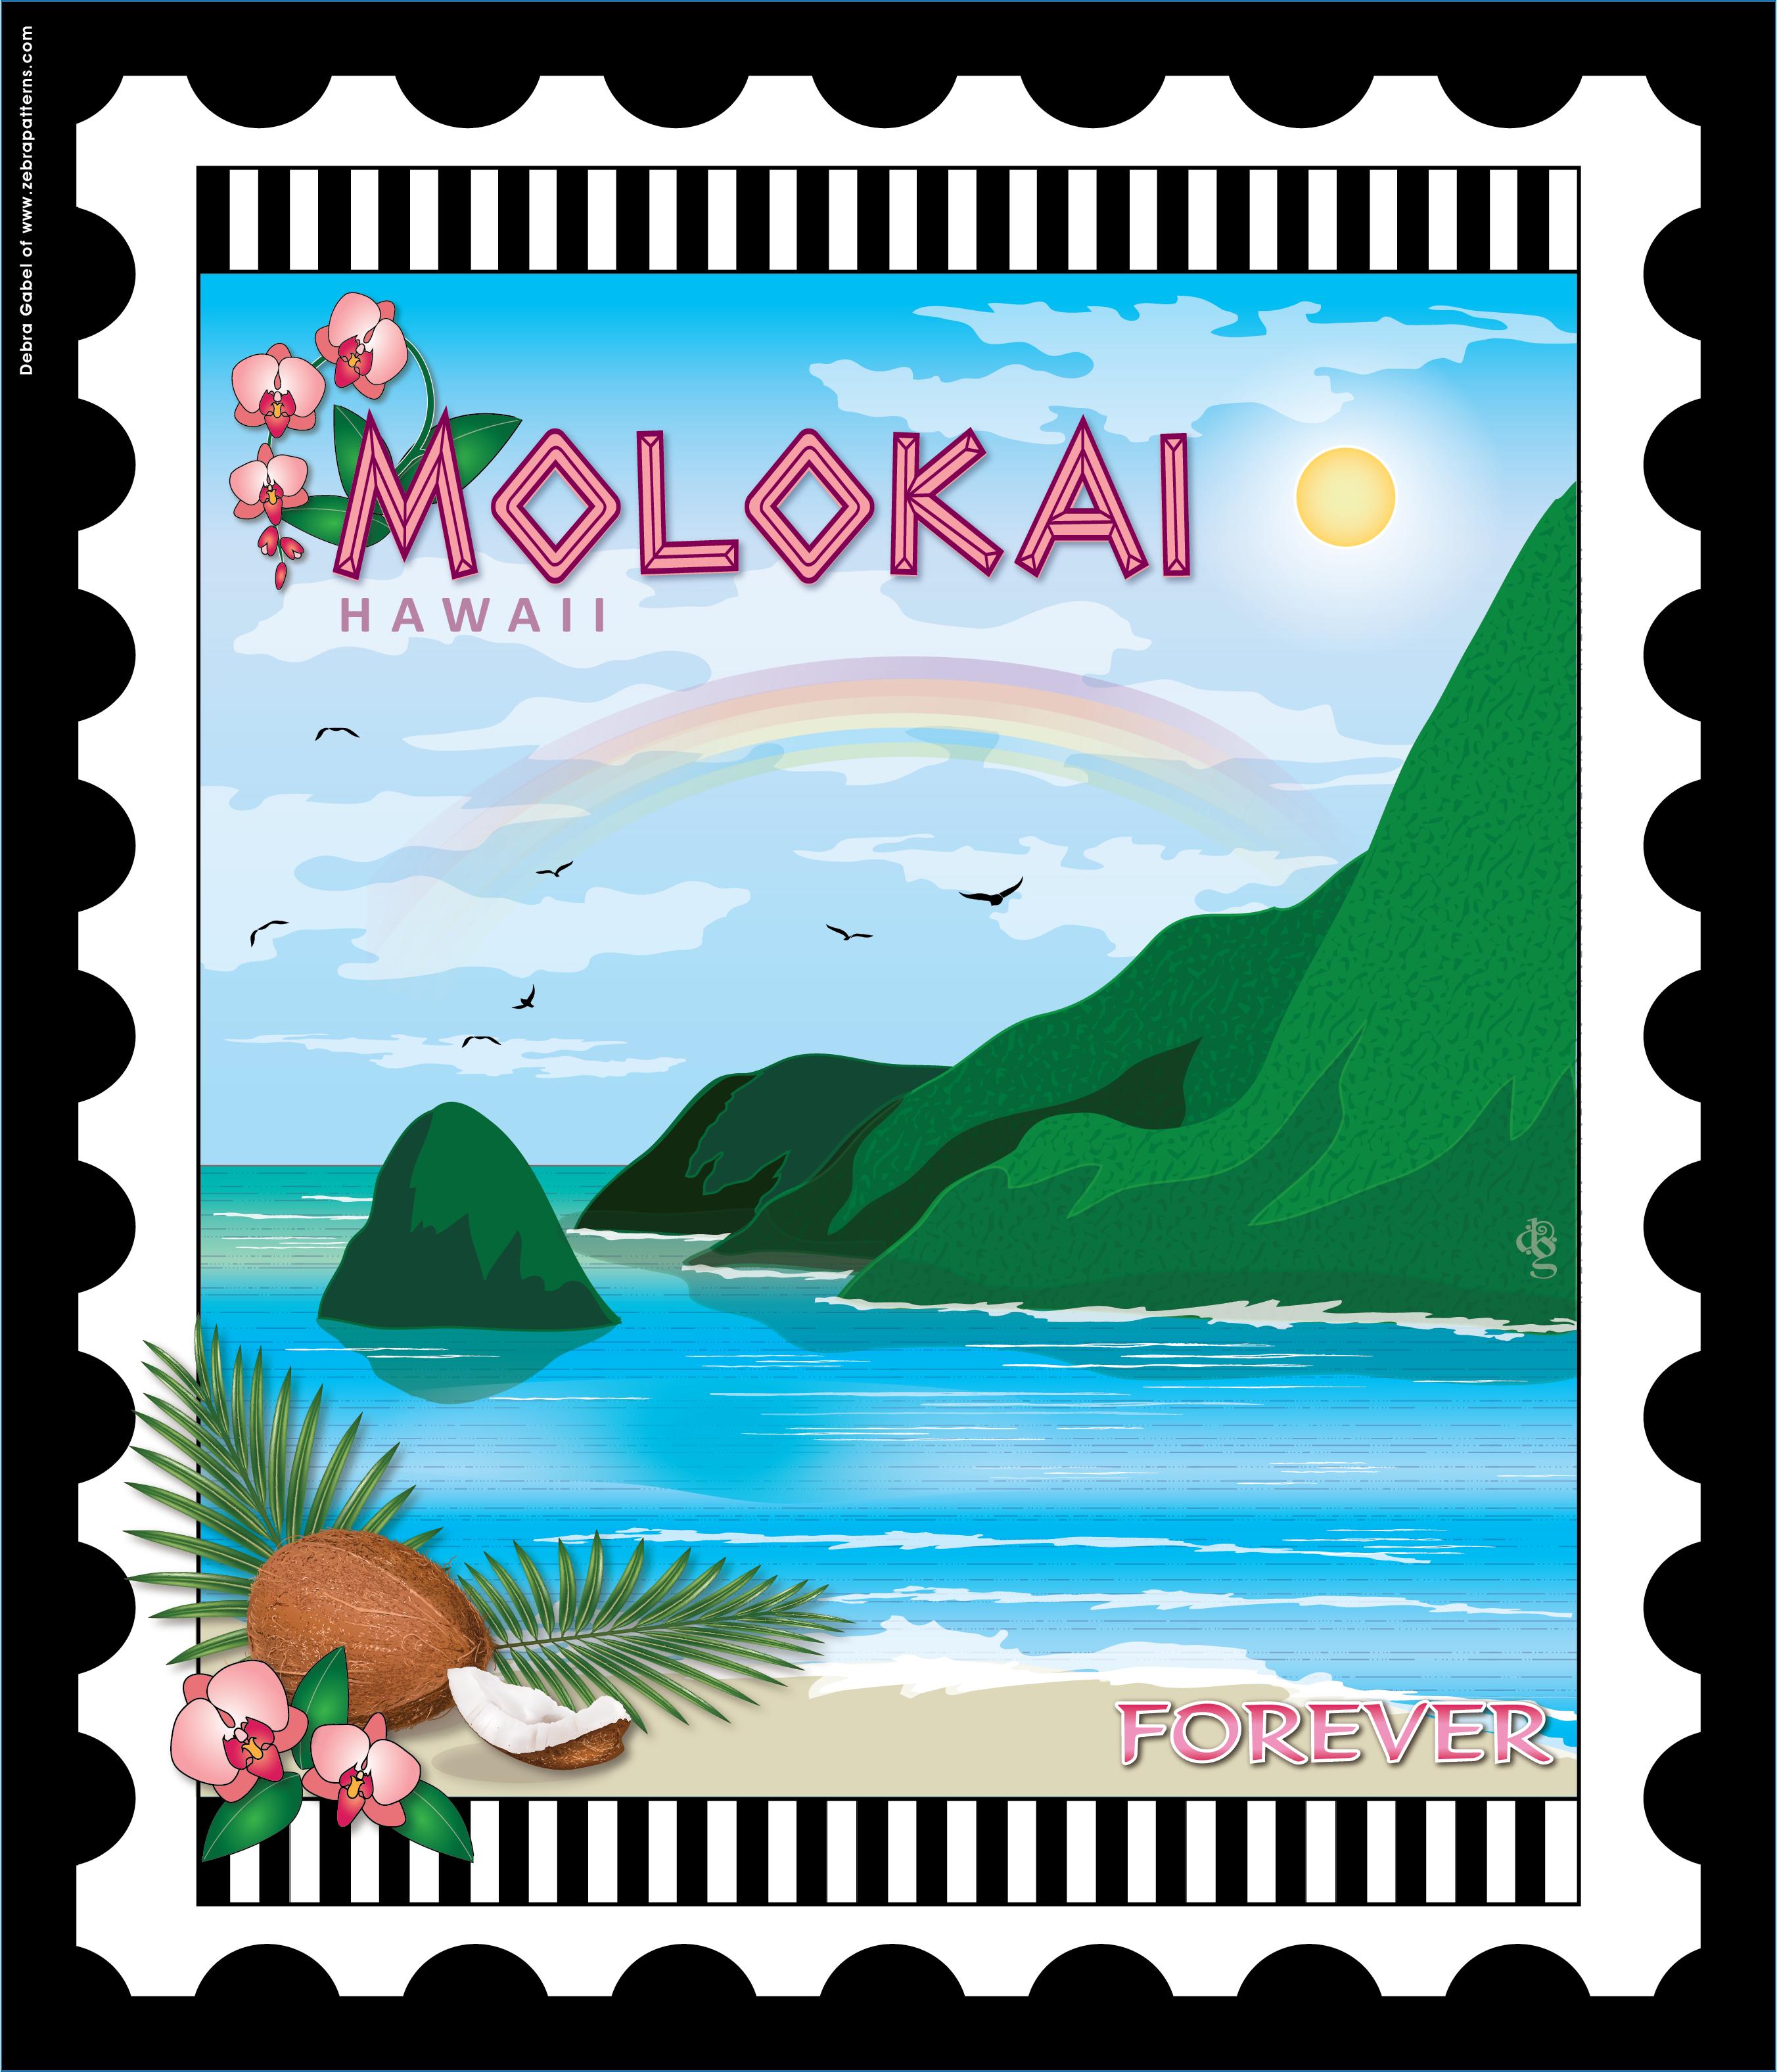 Molokai Hawaii Stamp By Debra Gabel Of Www Zebrapatterns Com Used